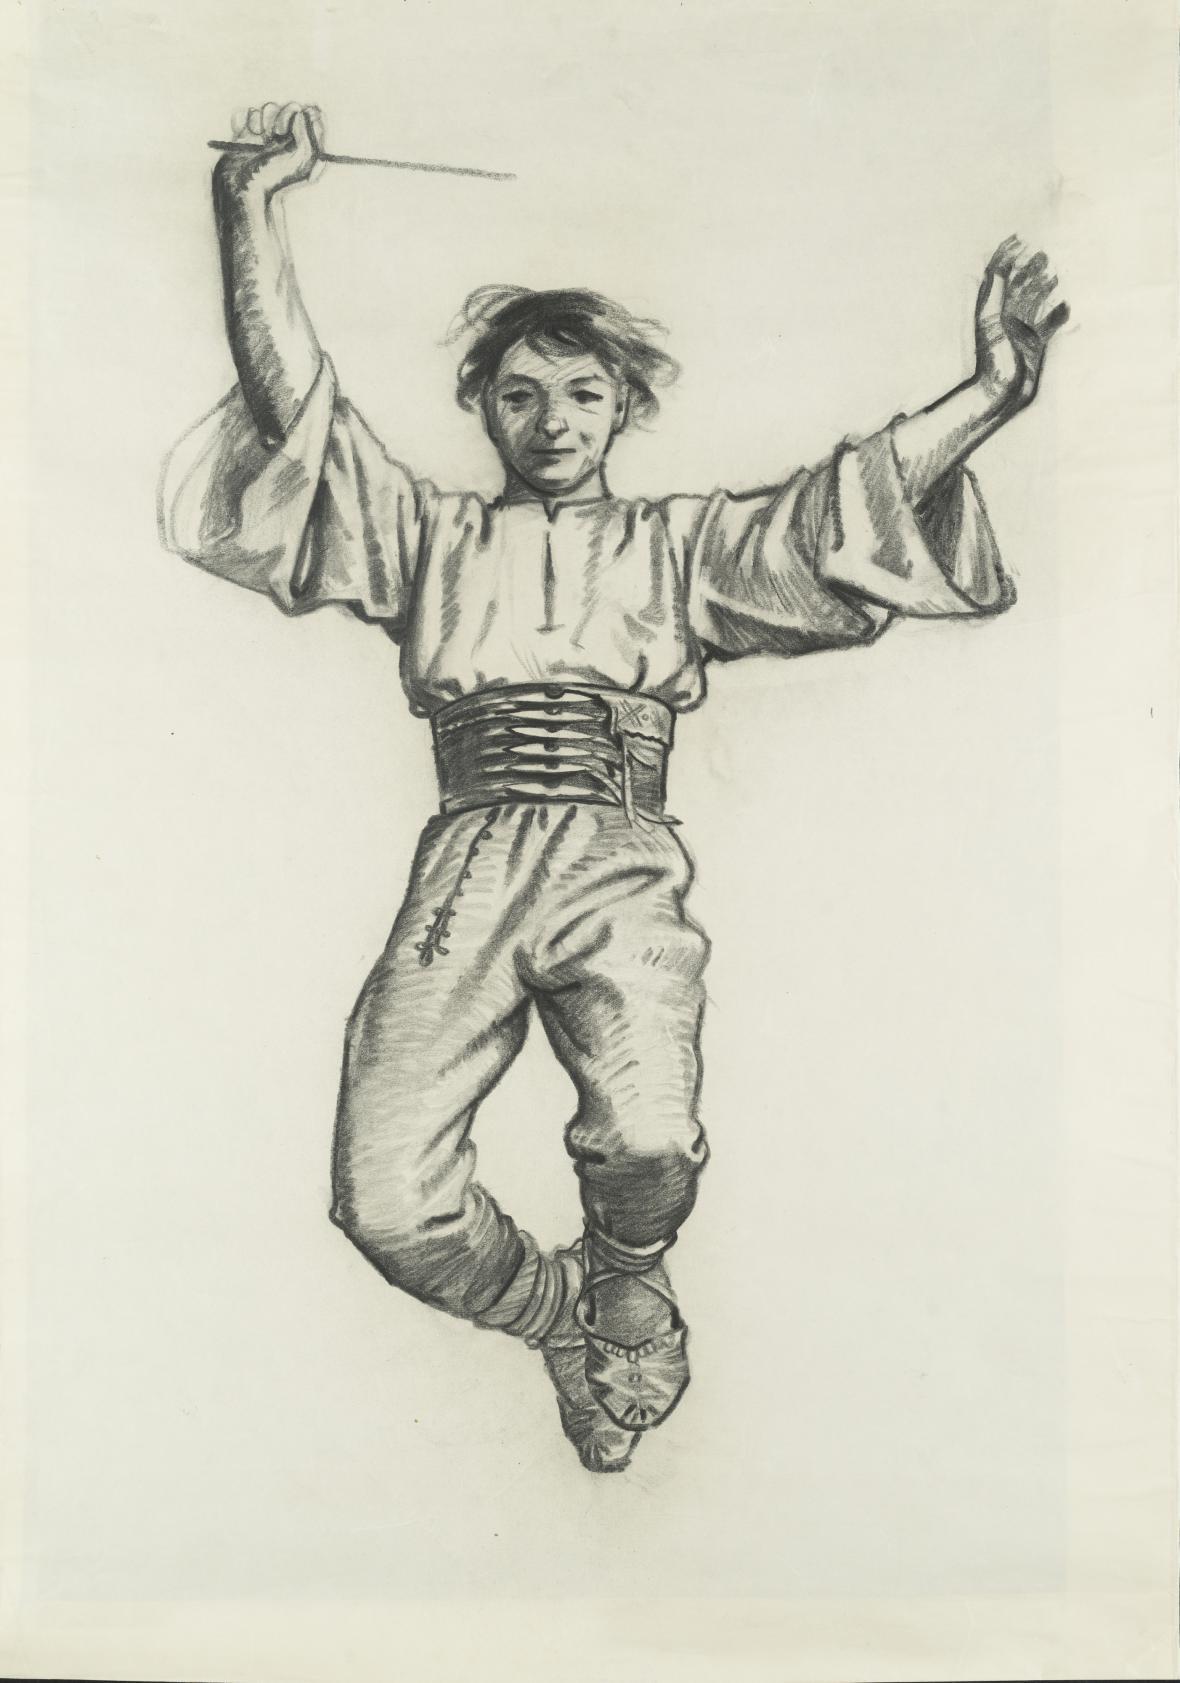 Adolf Zábranský / Na paměť osvobození, studie ke sgrafitu v Ledeburské zahradě, 1955